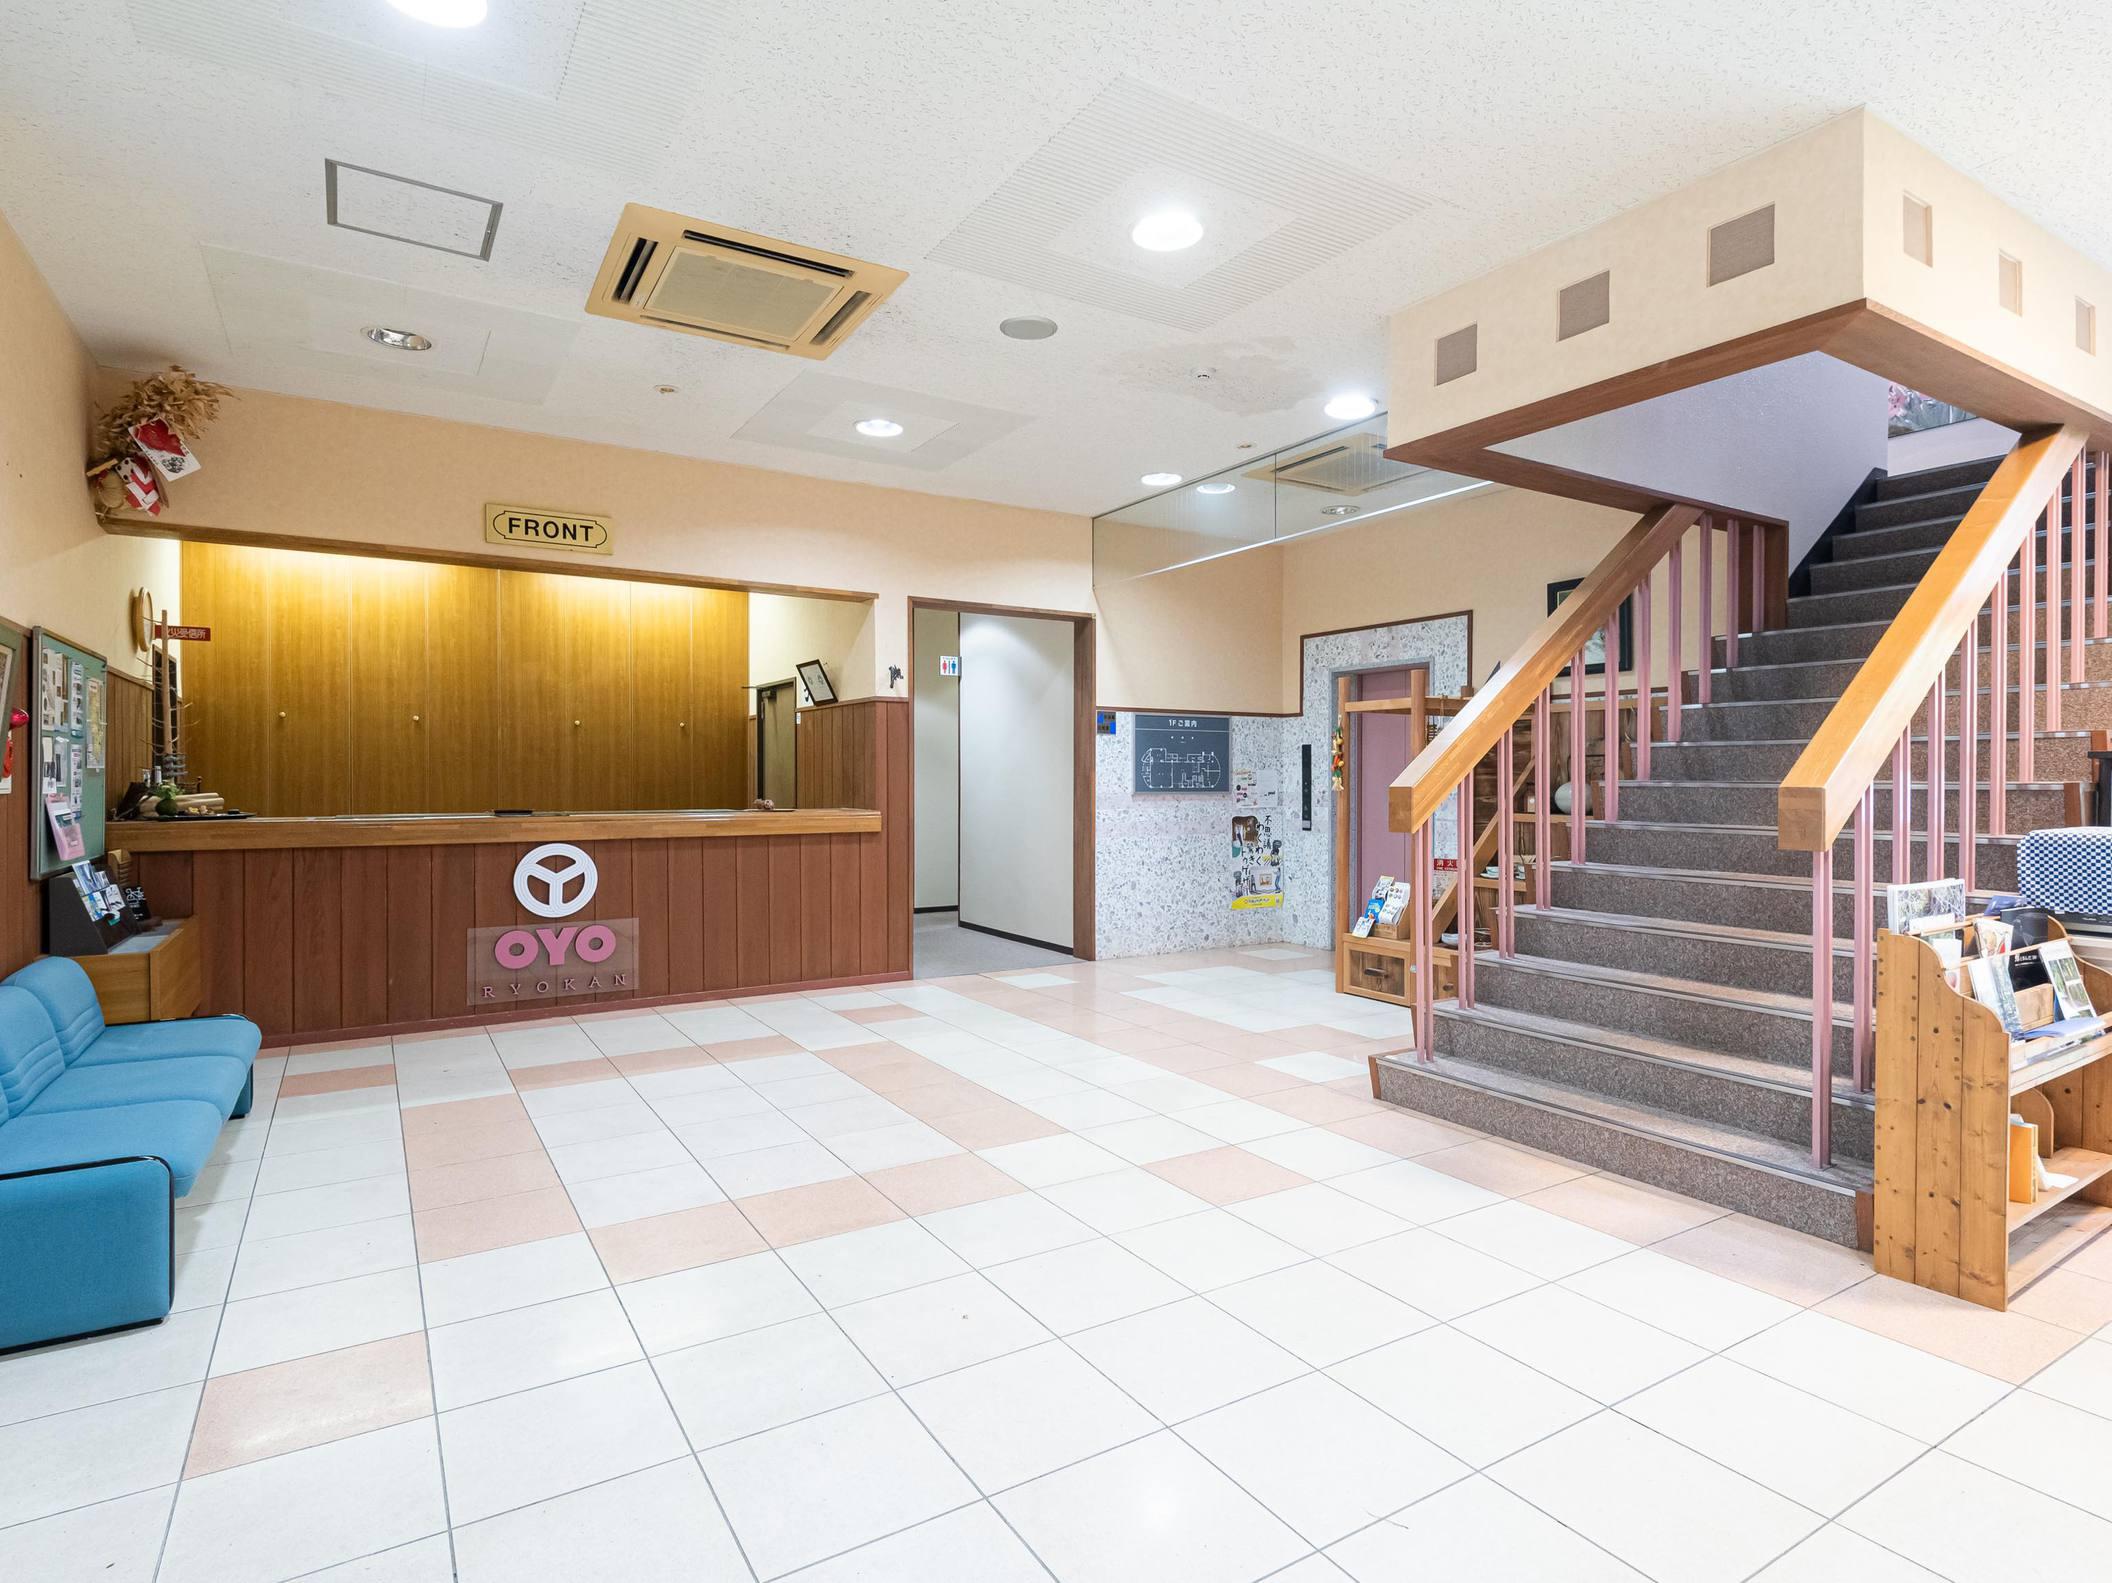 OYO旅館 琴の滝荘 すさみ町 関連画像 2枚目 楽天トラベル提供